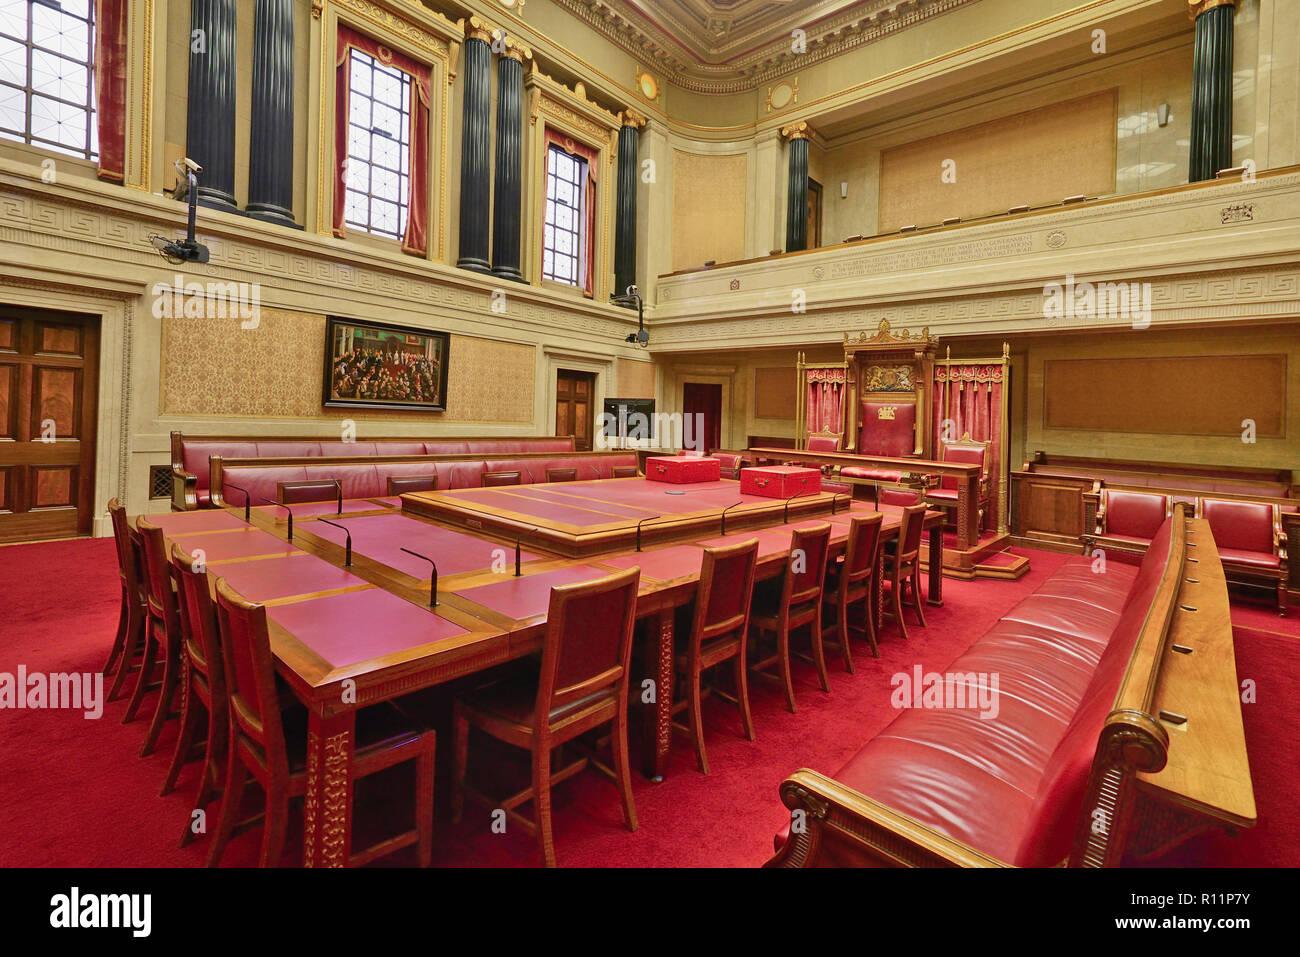 Northern Ireland, County Antrim, Stormont, Parliament Buildings, Senate of Northern Ireland chamber. - Stock Image